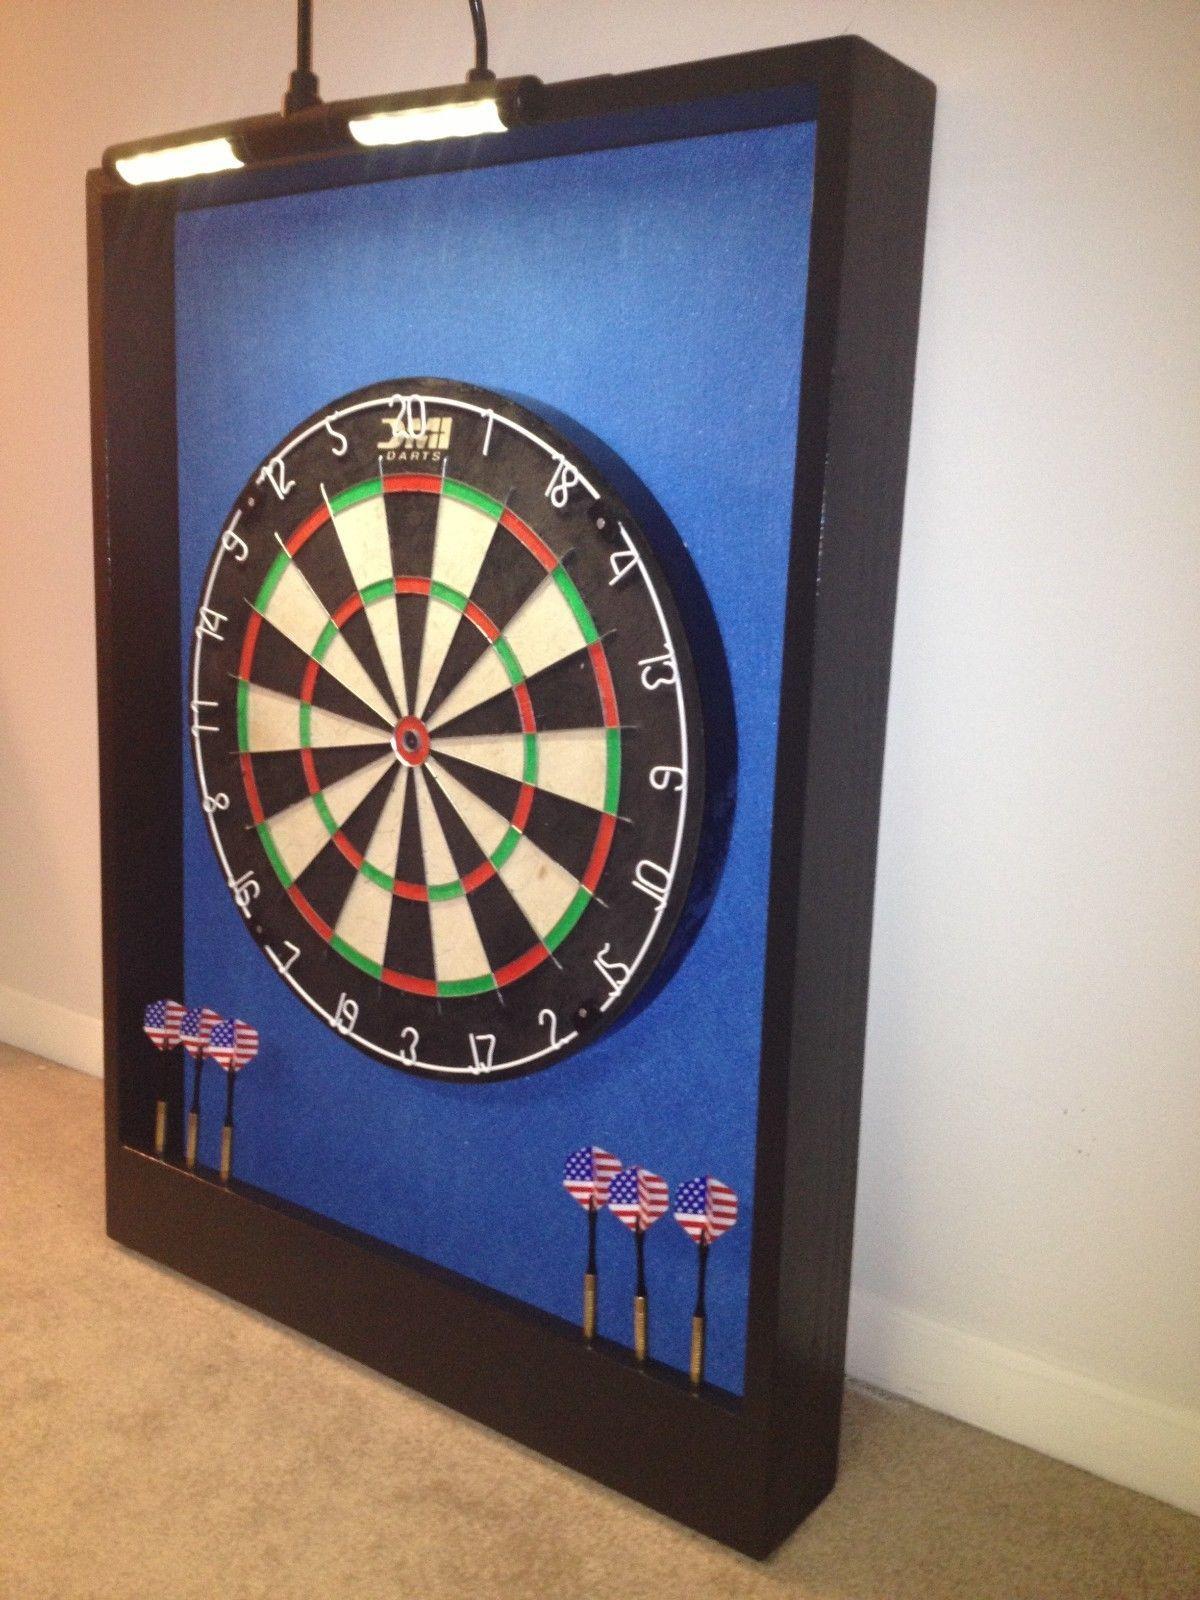 Lighted Carolina Blue Black Trim Dart Board Cabinet w LED Cordless Light | eBay & Lighted Carolina Blue Black Trim Dart Board Cabinet w LED Cordless ...